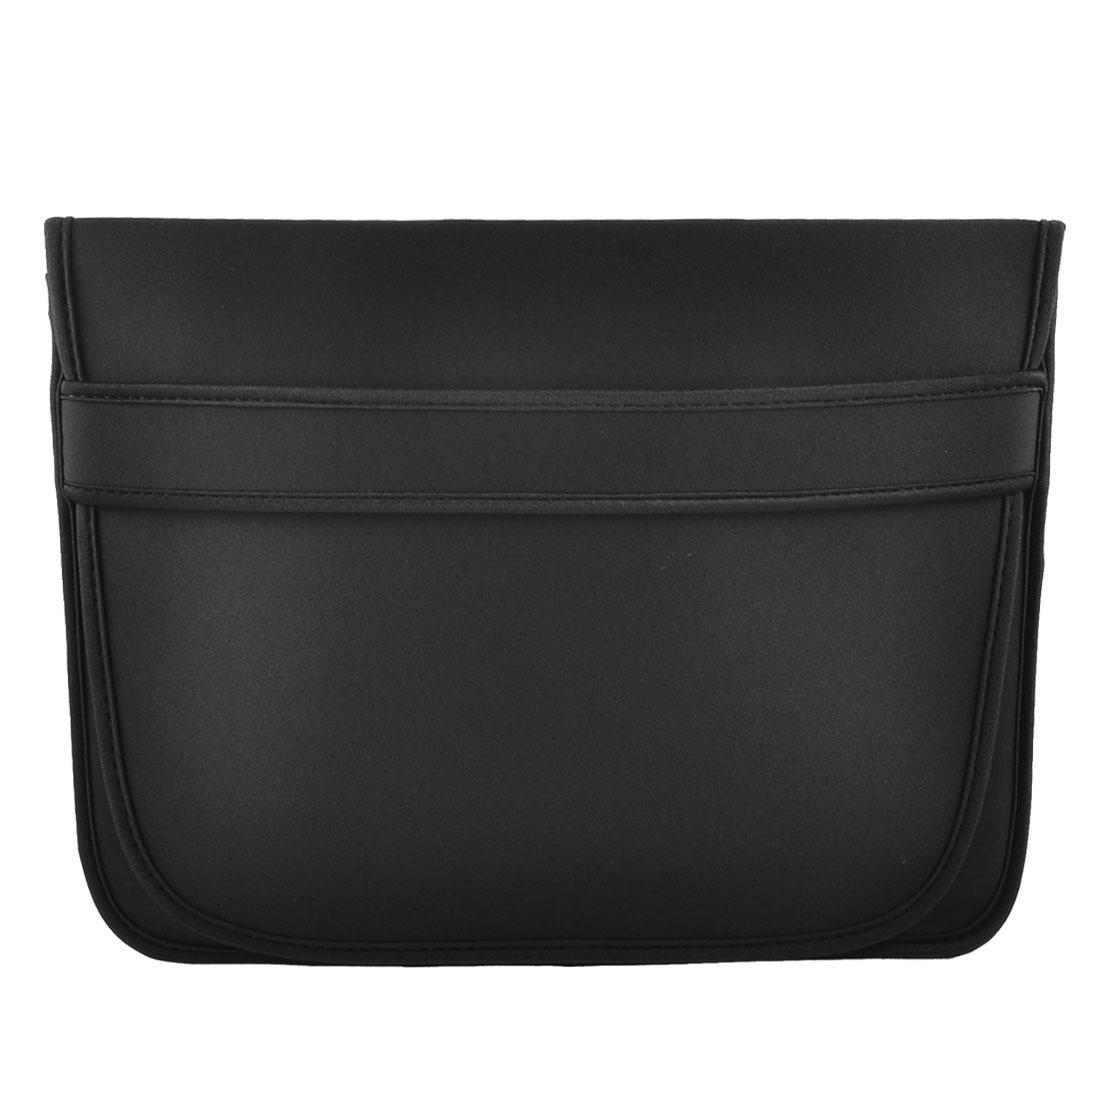 "10"" 10.1"" Tablet Laptop Flip Up Neoprene Sleeve Bag Case Pouch Cover Black"